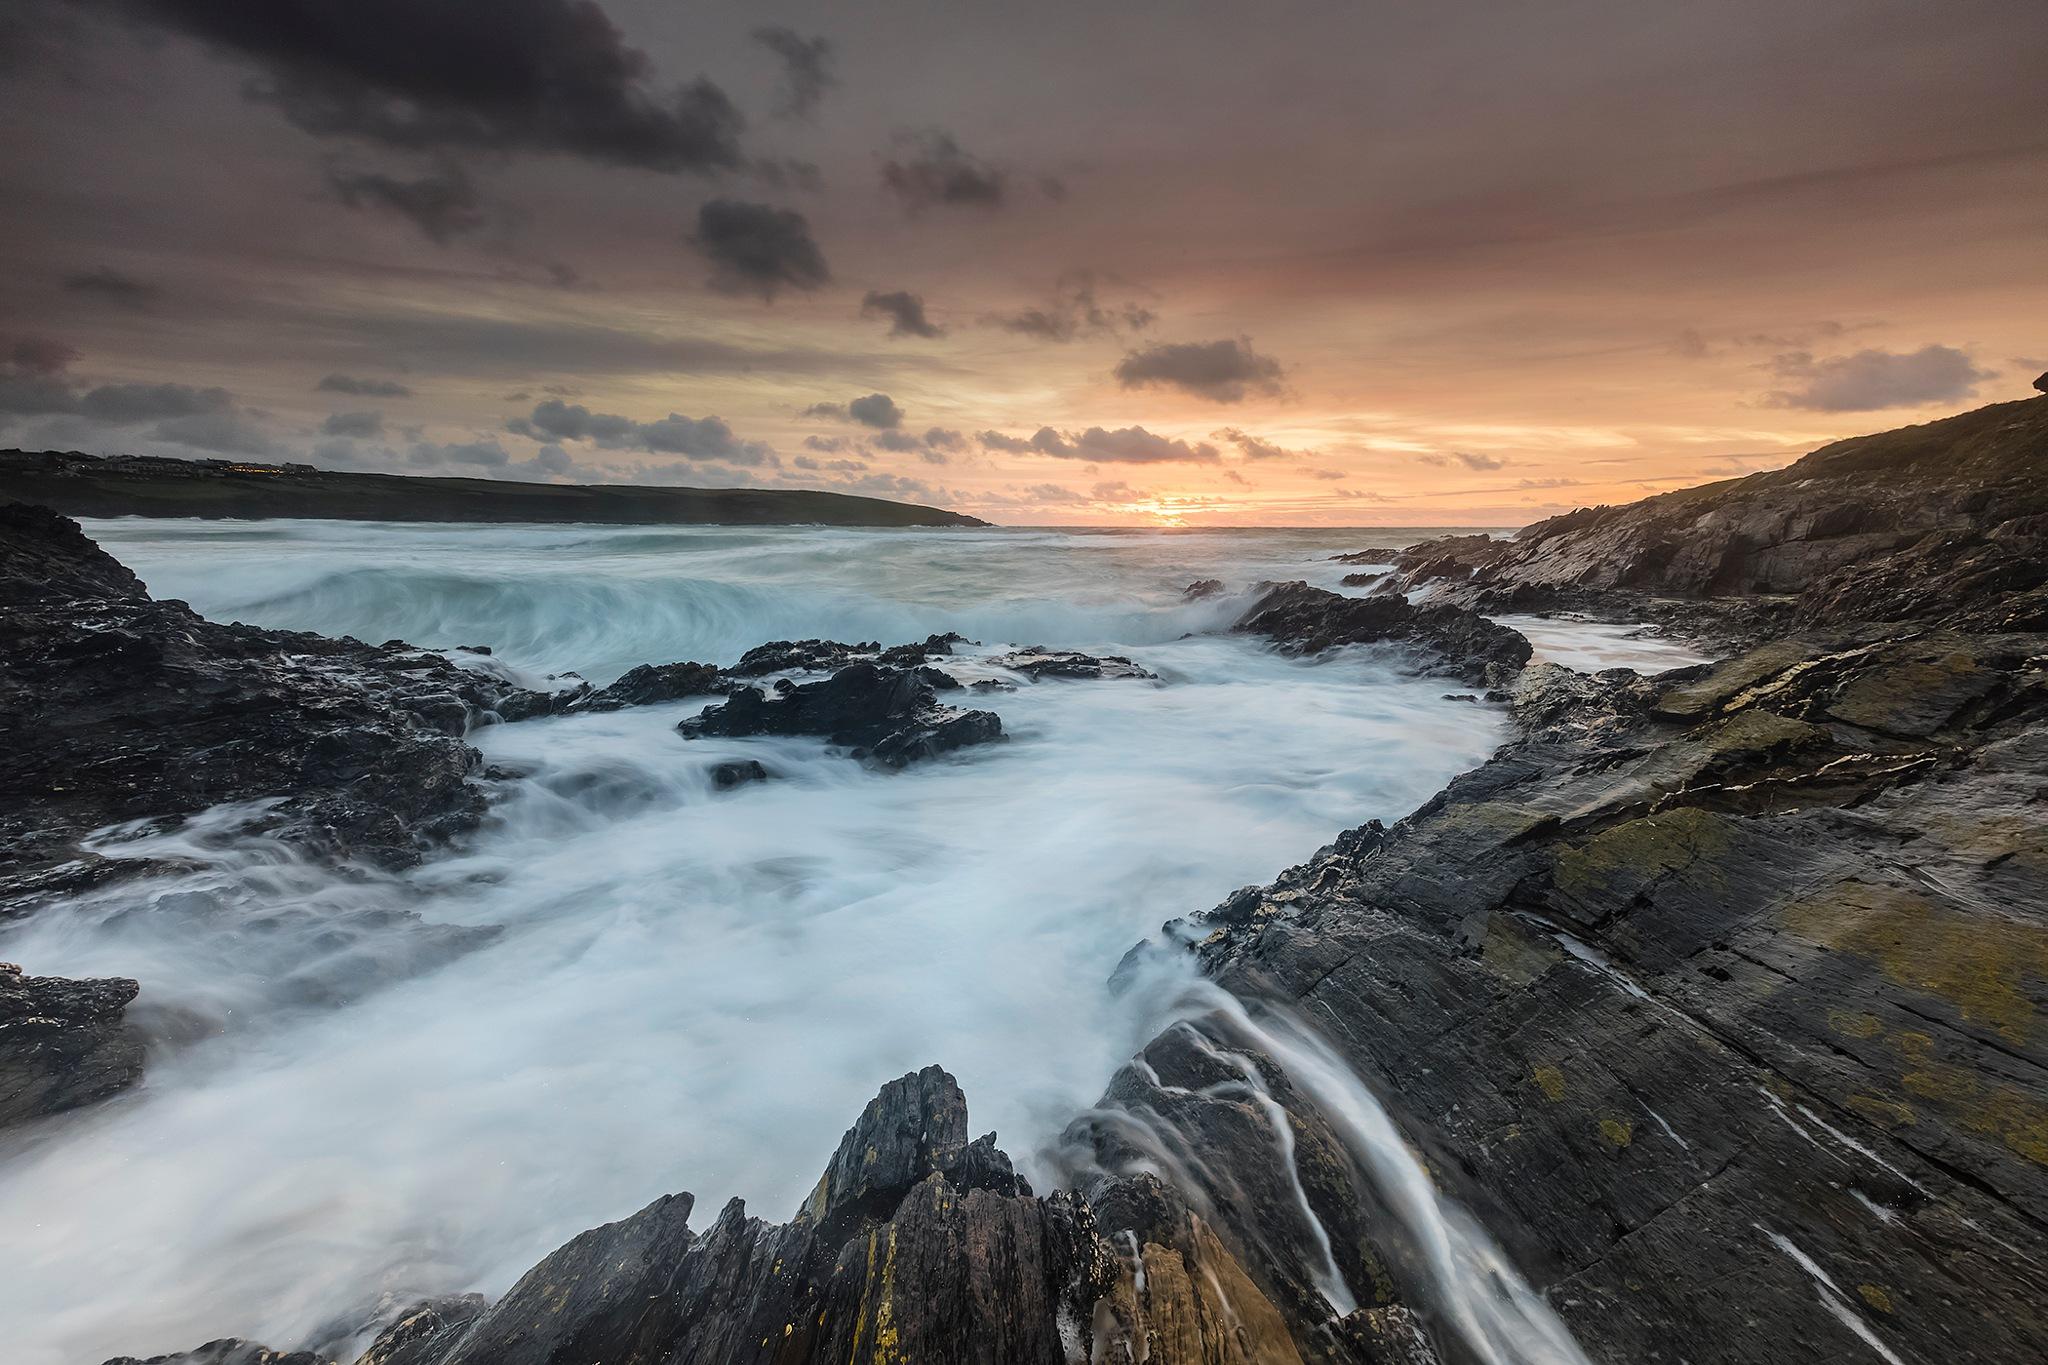 Crantock Ledge Sundown by Chris Simmons Photography